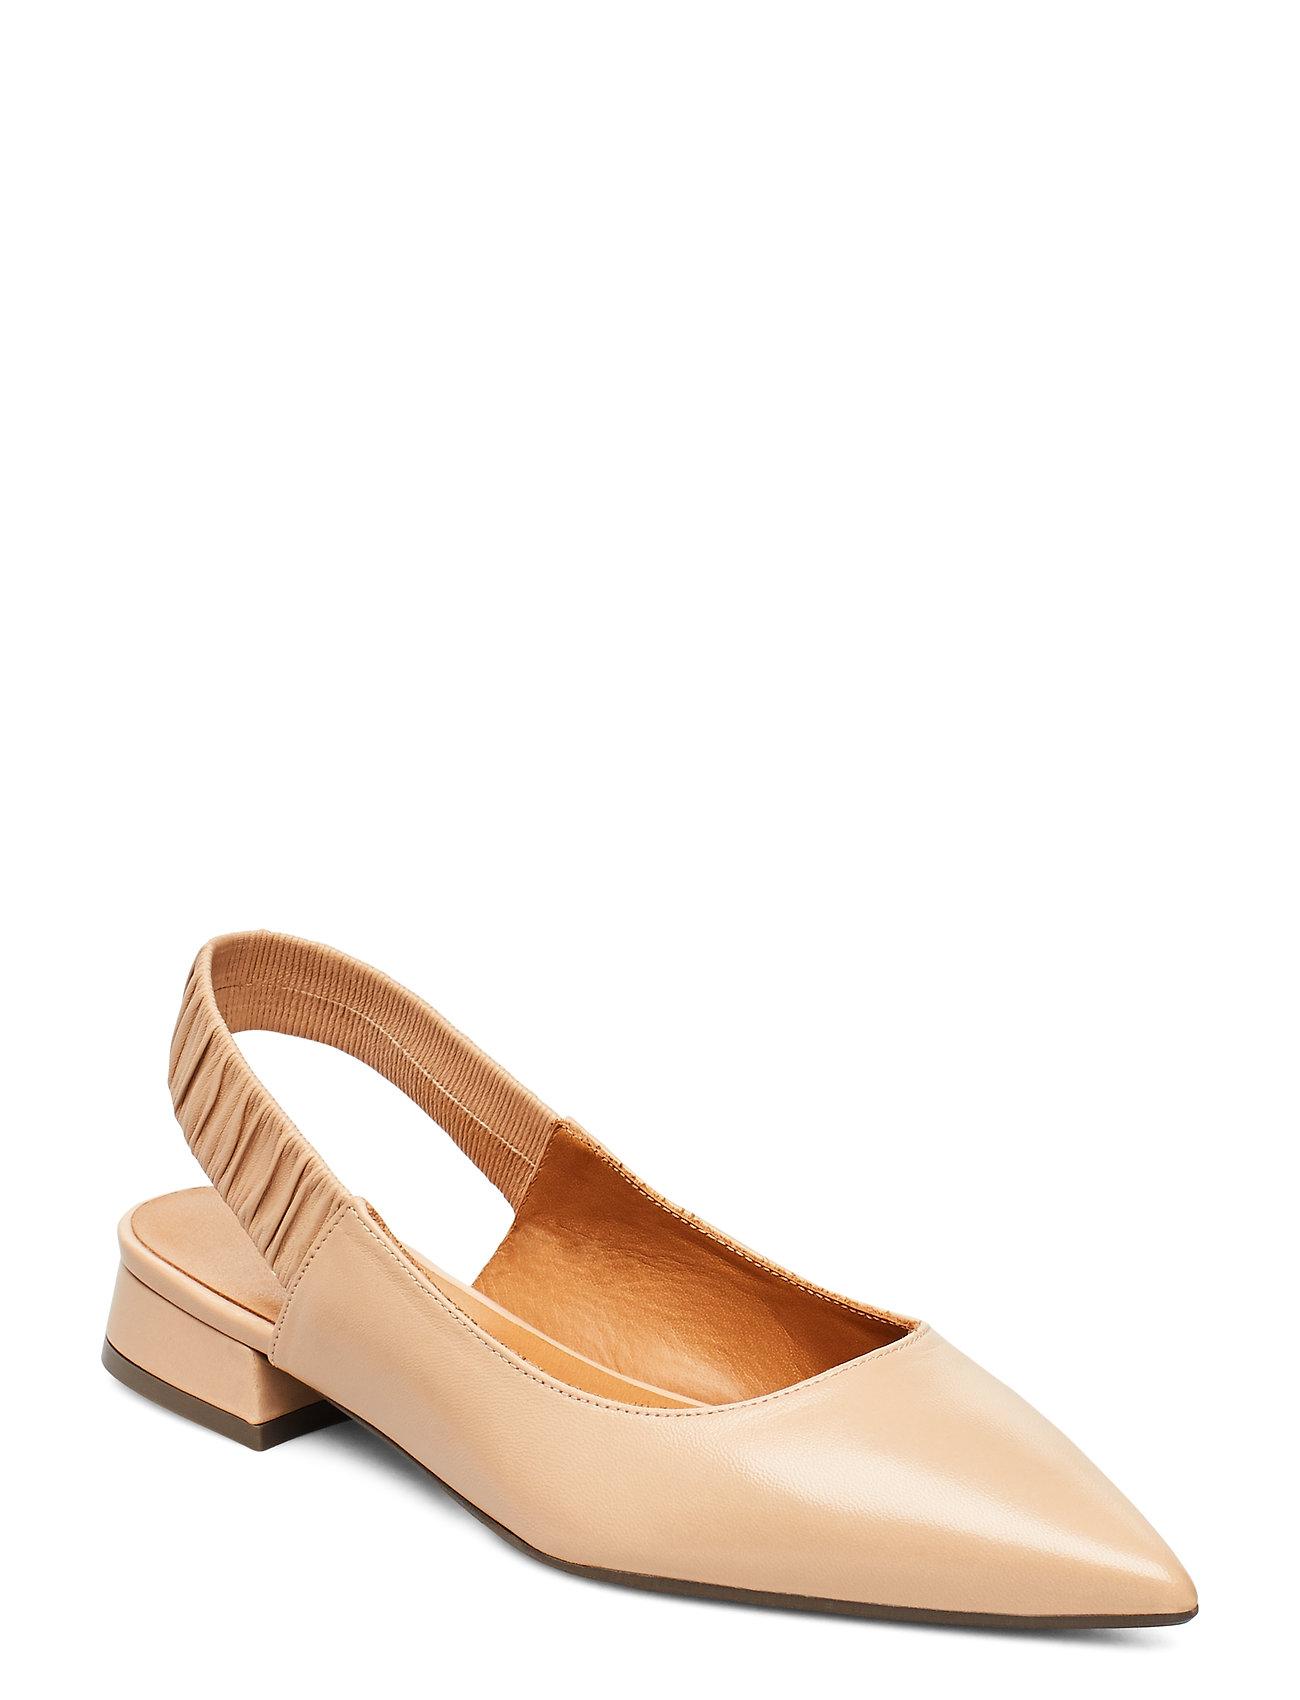 Billi Bi Shoes 4512 - BEIGE 5845 NAPPA 72